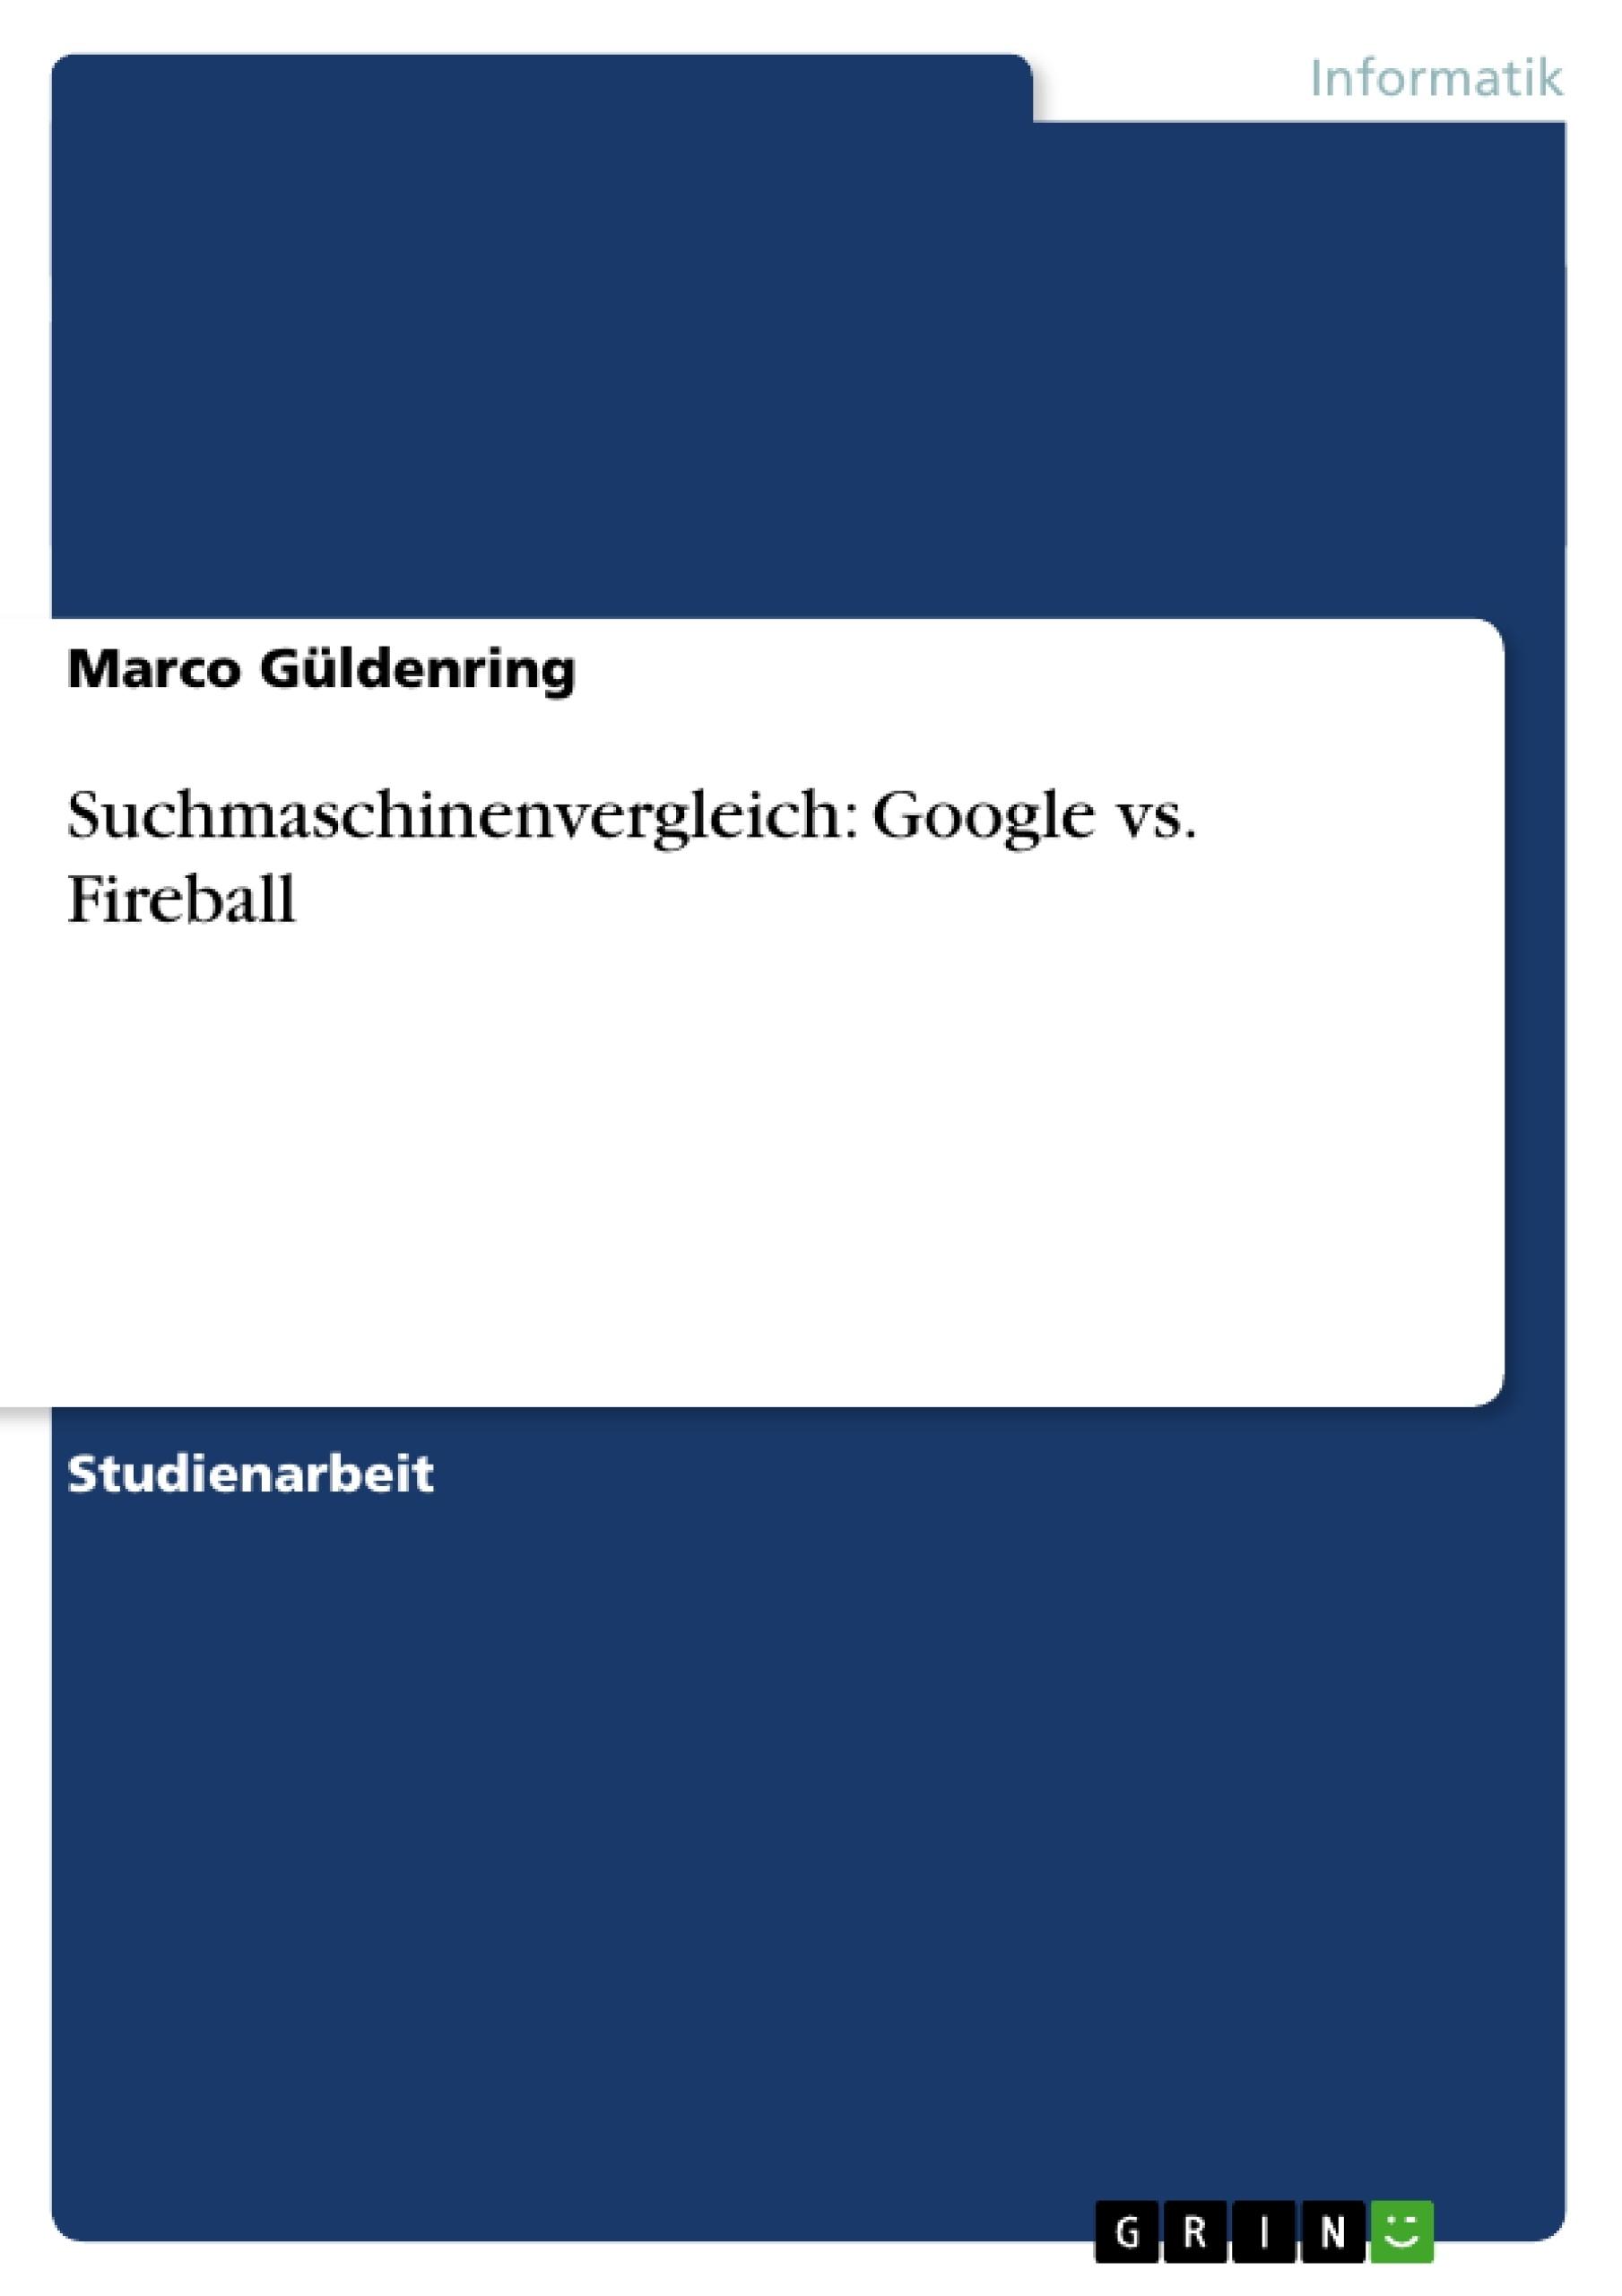 Titel: Suchmaschinenvergleich: Google vs. Fireball